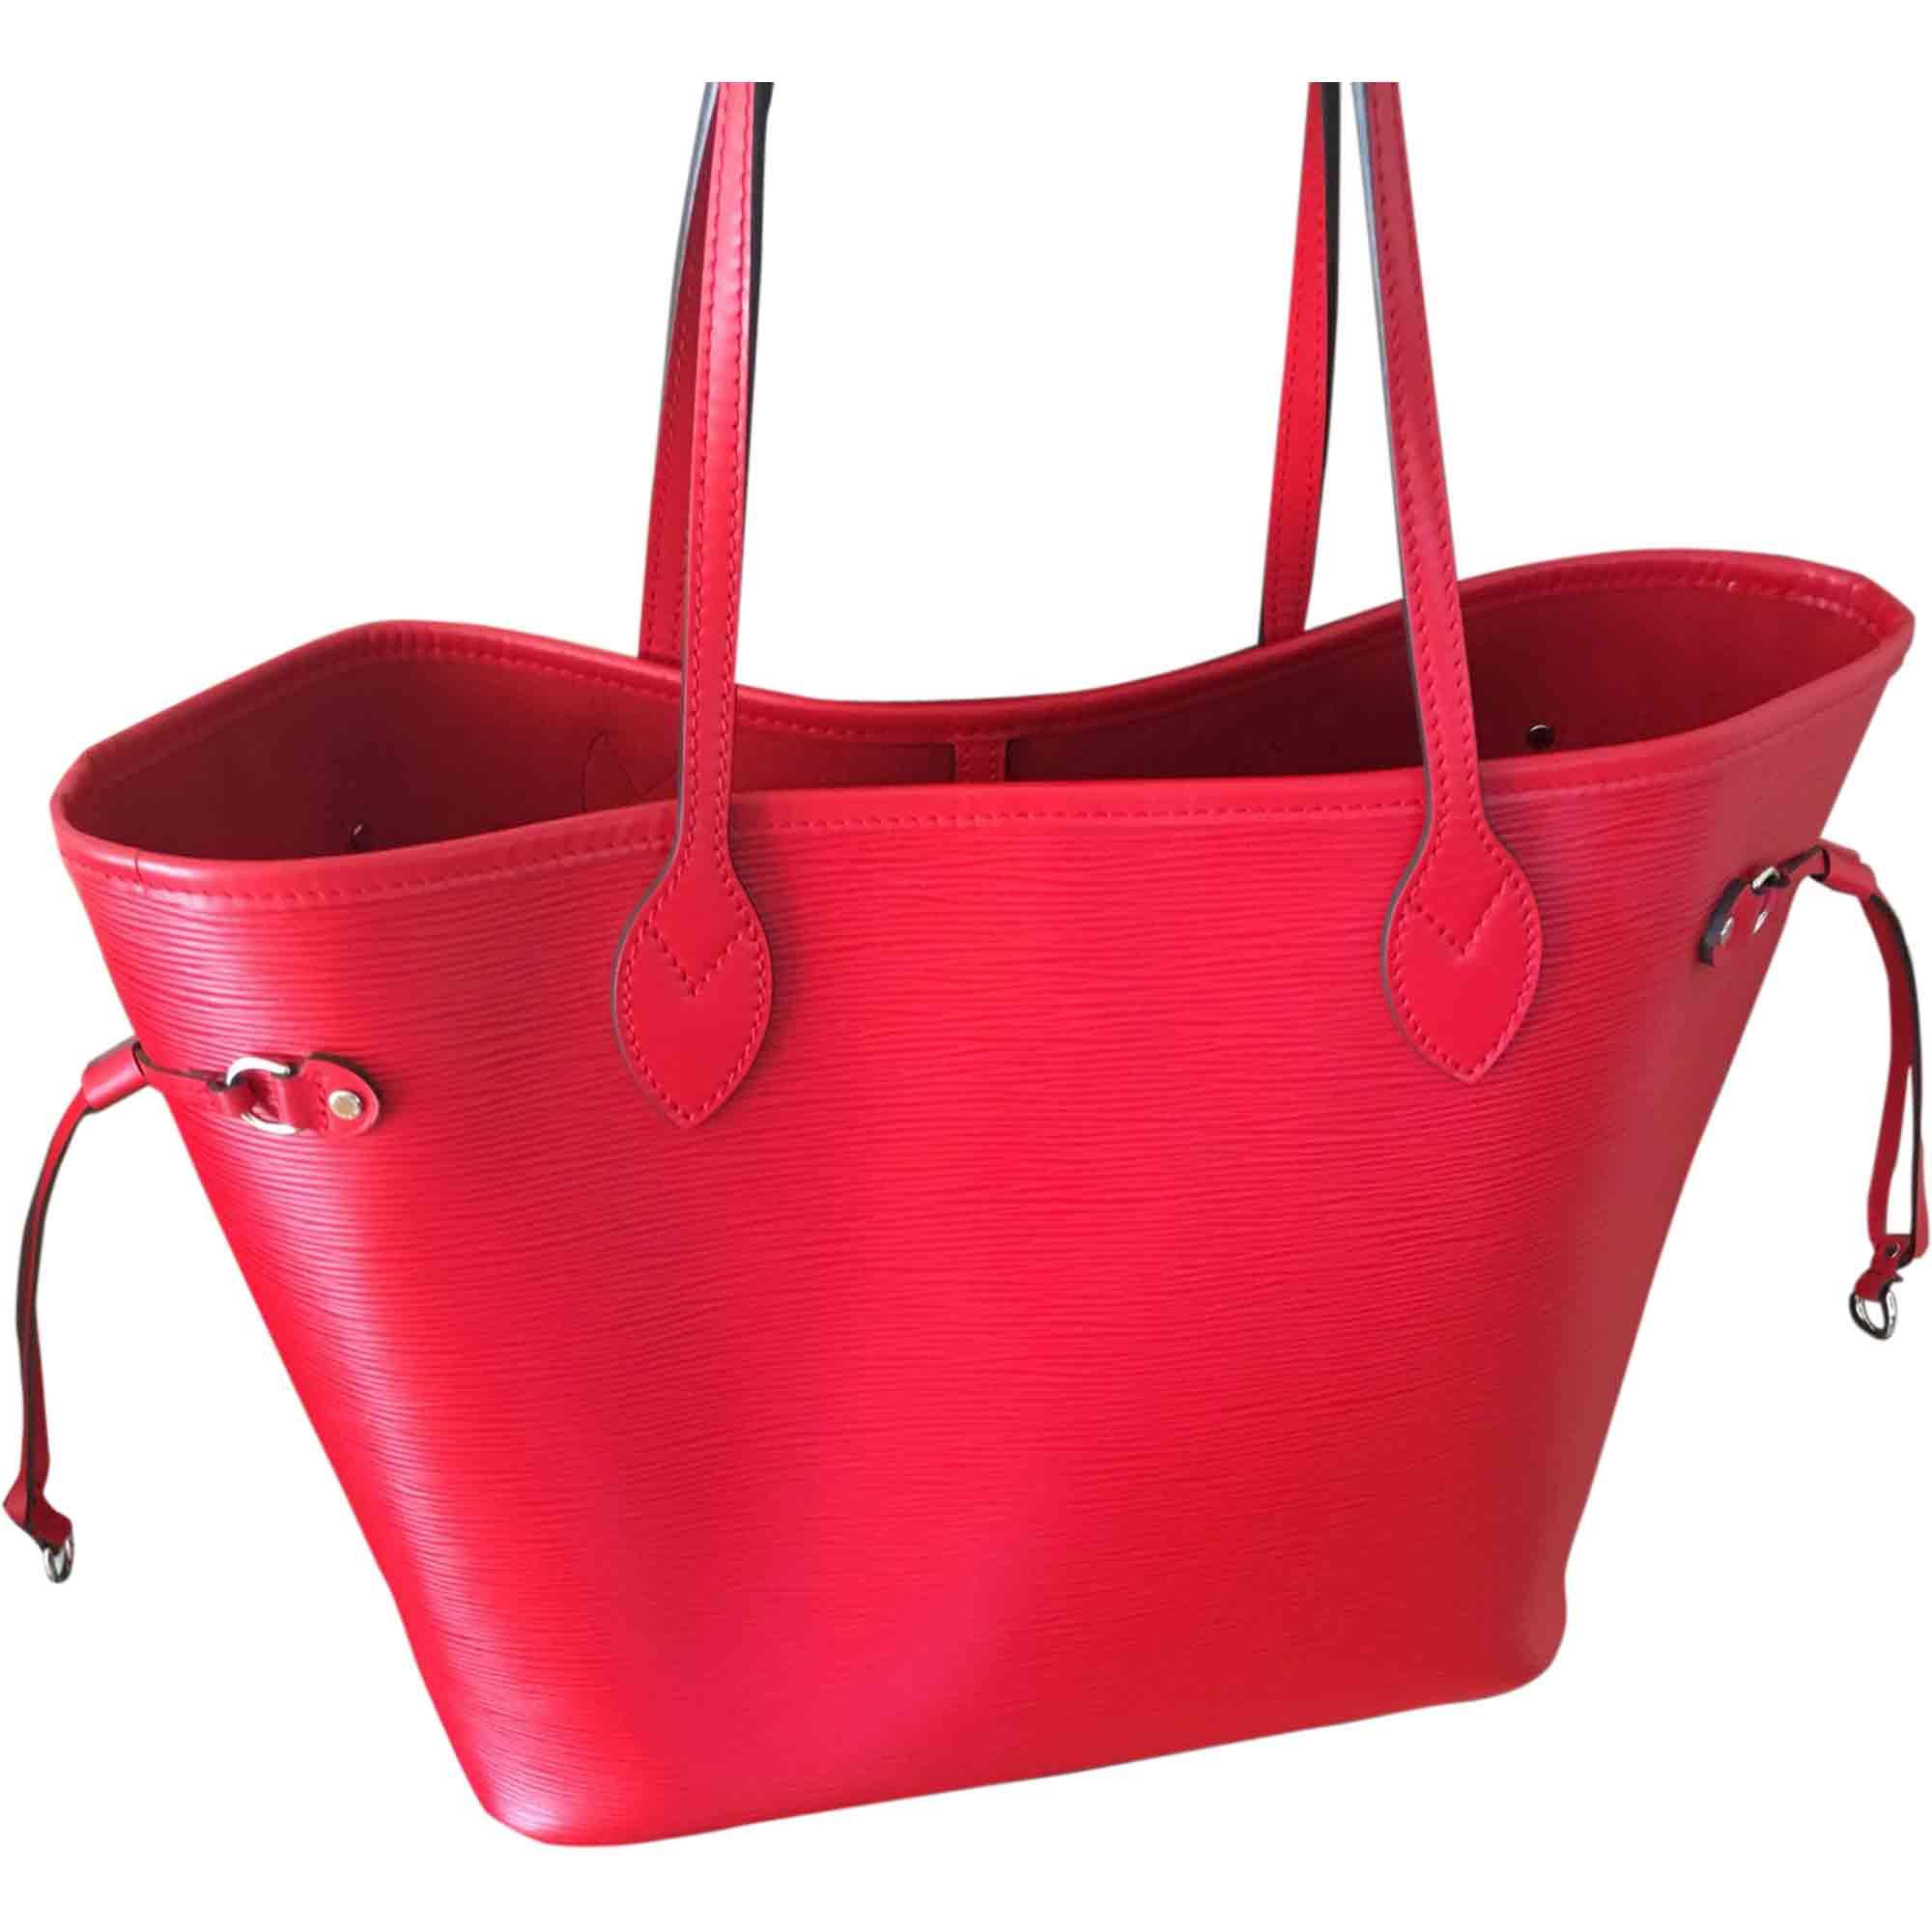 Leather Handbag LOUIS VUITTON Red, burgundy